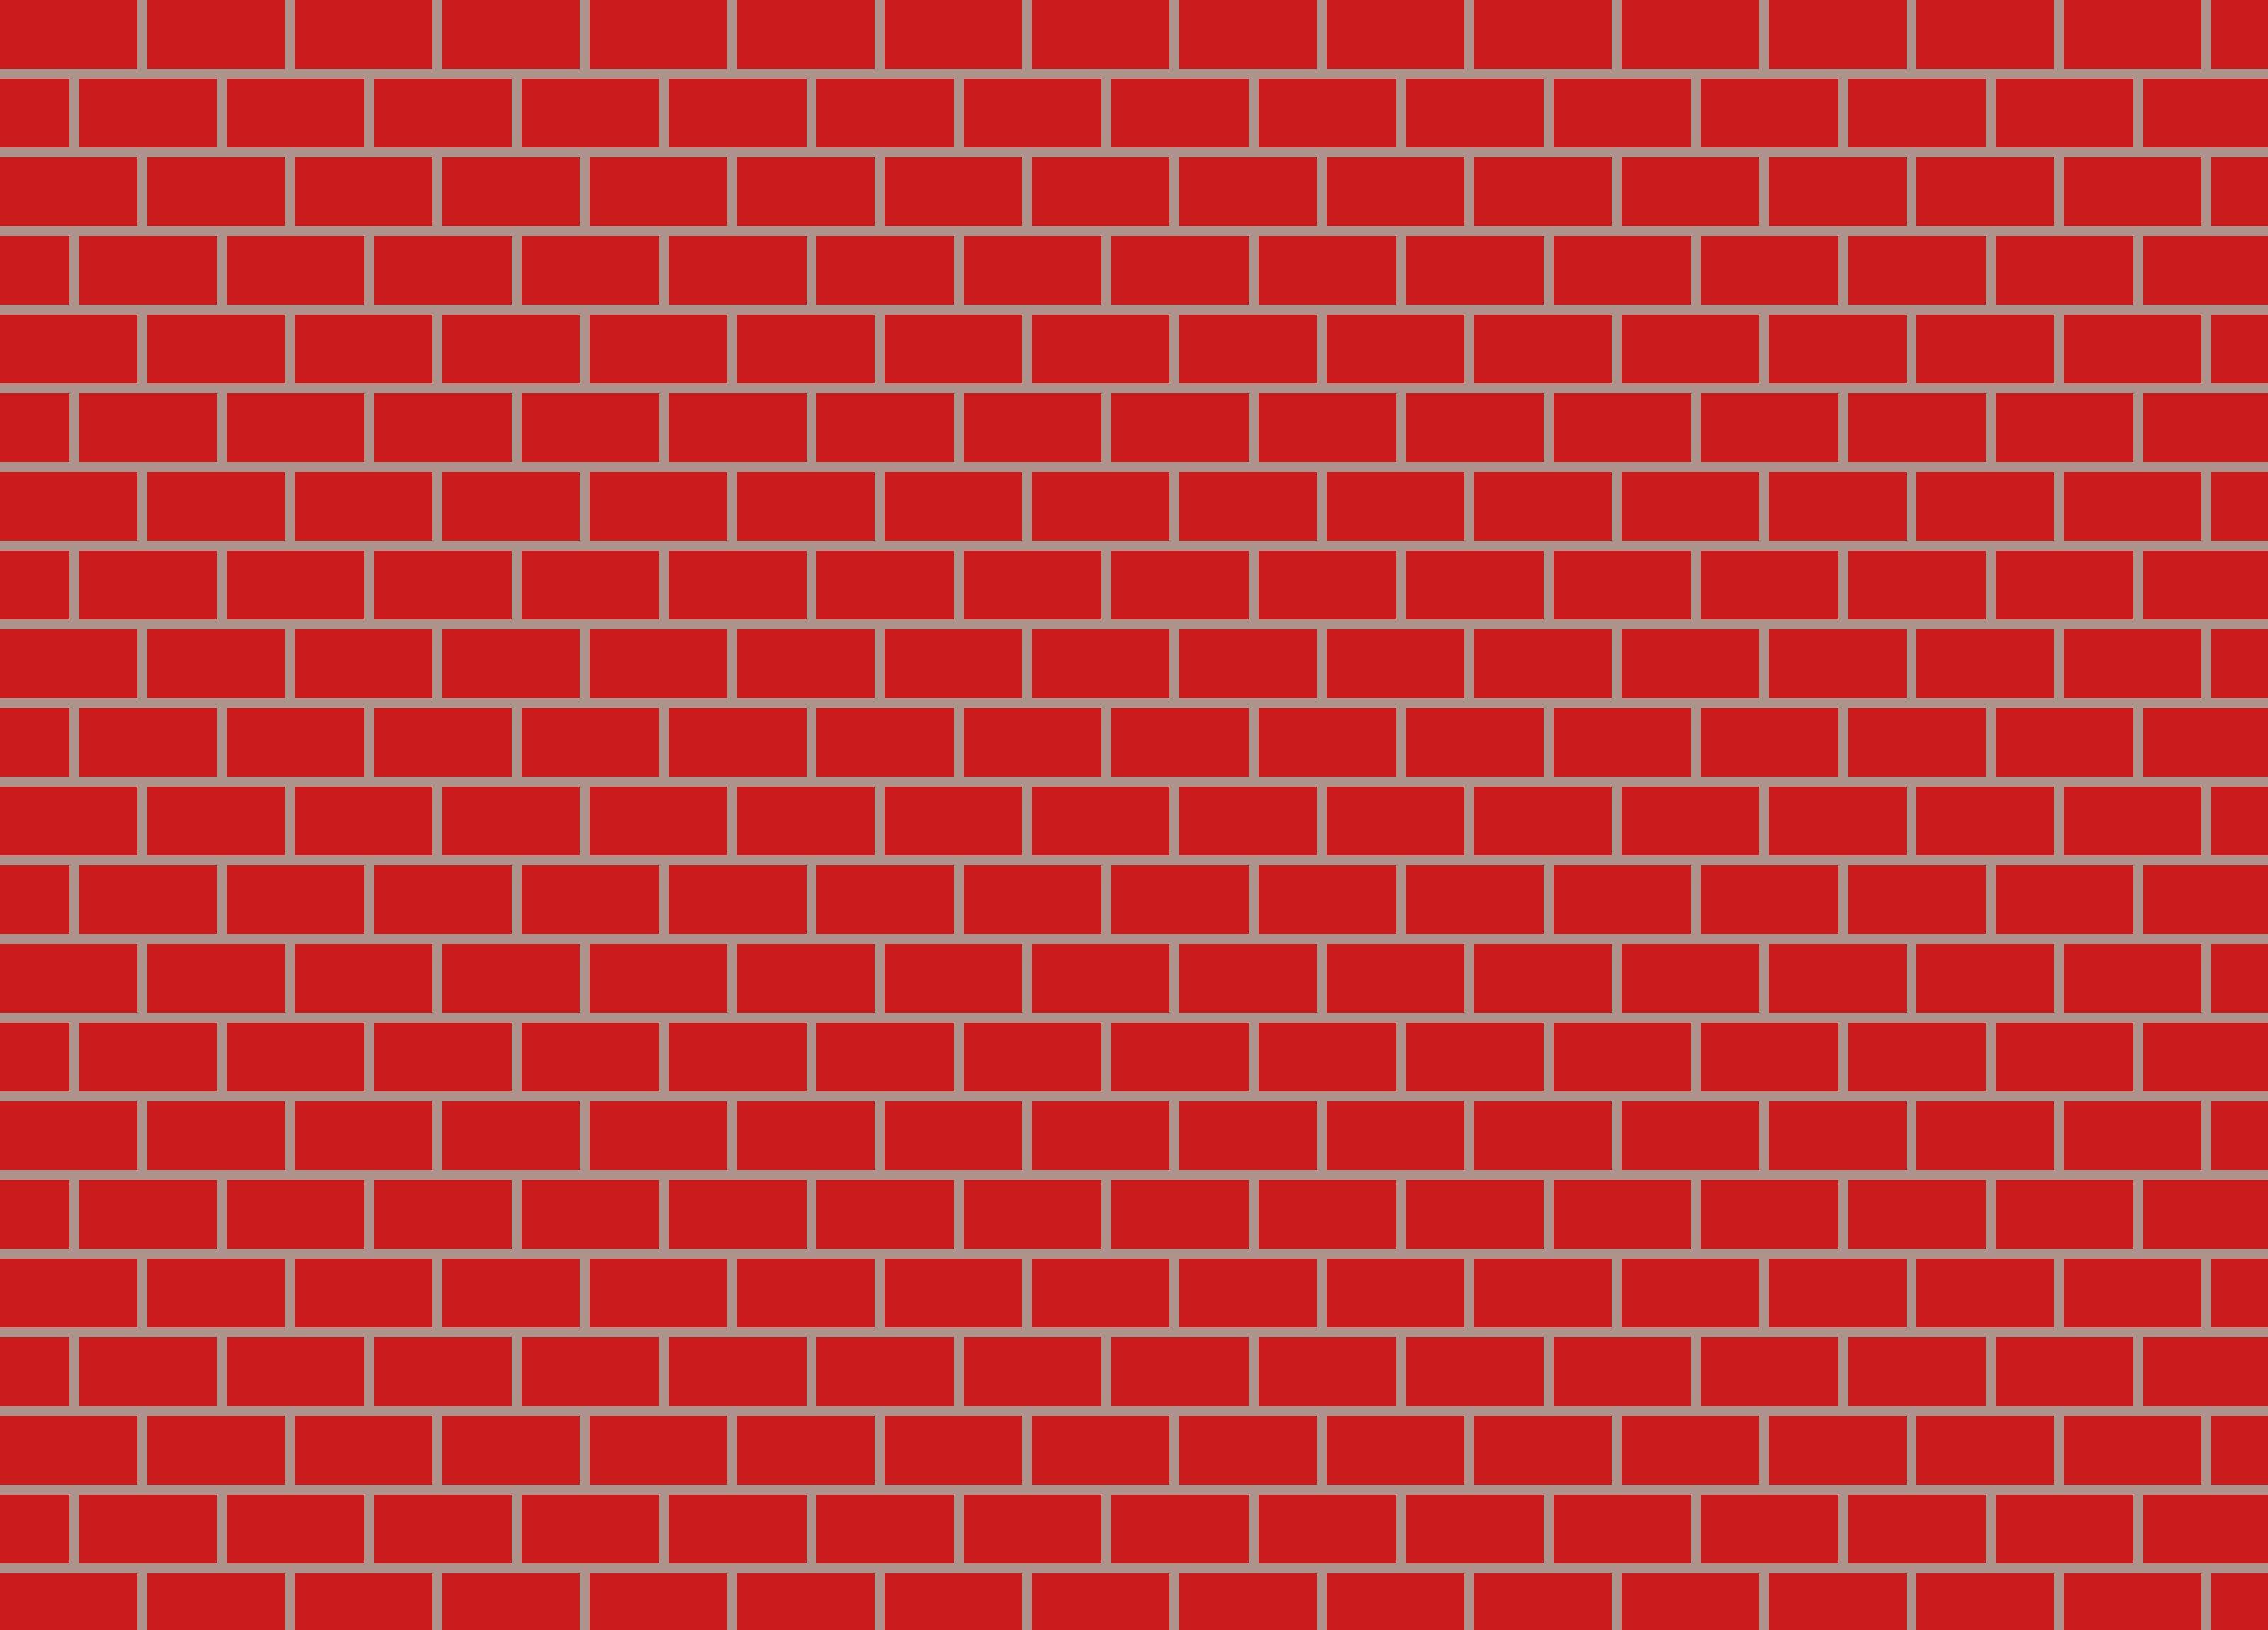 Printable Brick Pattern Lovely Free Printable Brick Pattern Wallpaper Wallpapersafari